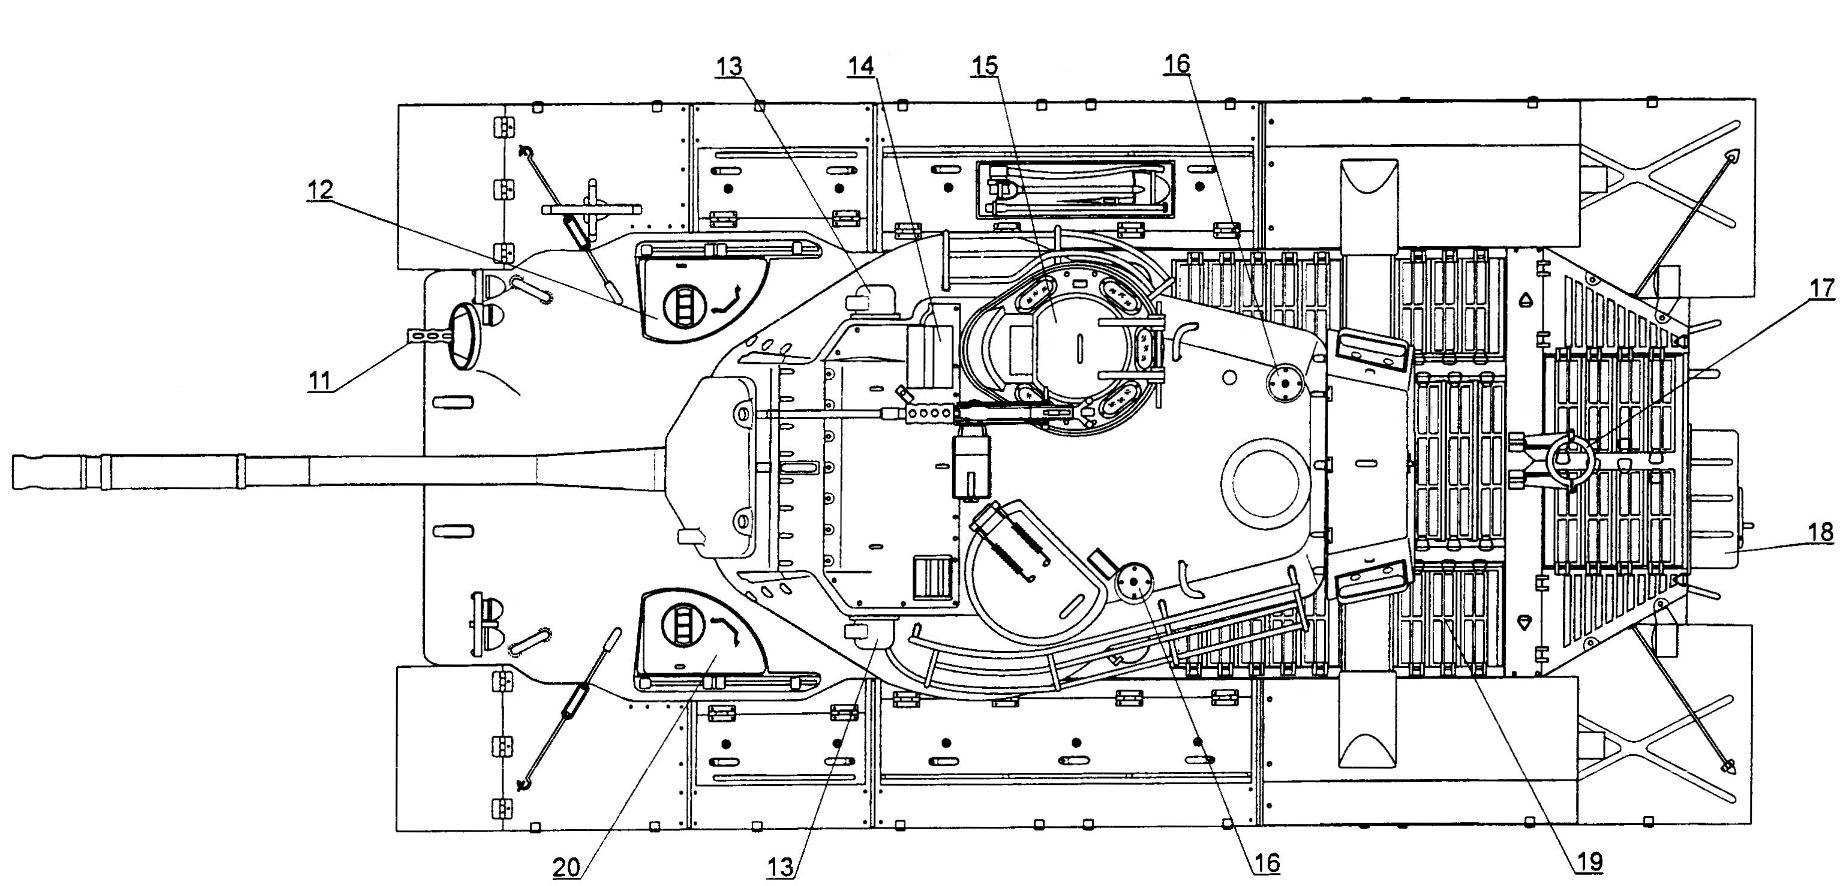 M47 Wiring Diagram | Wiring Liry on